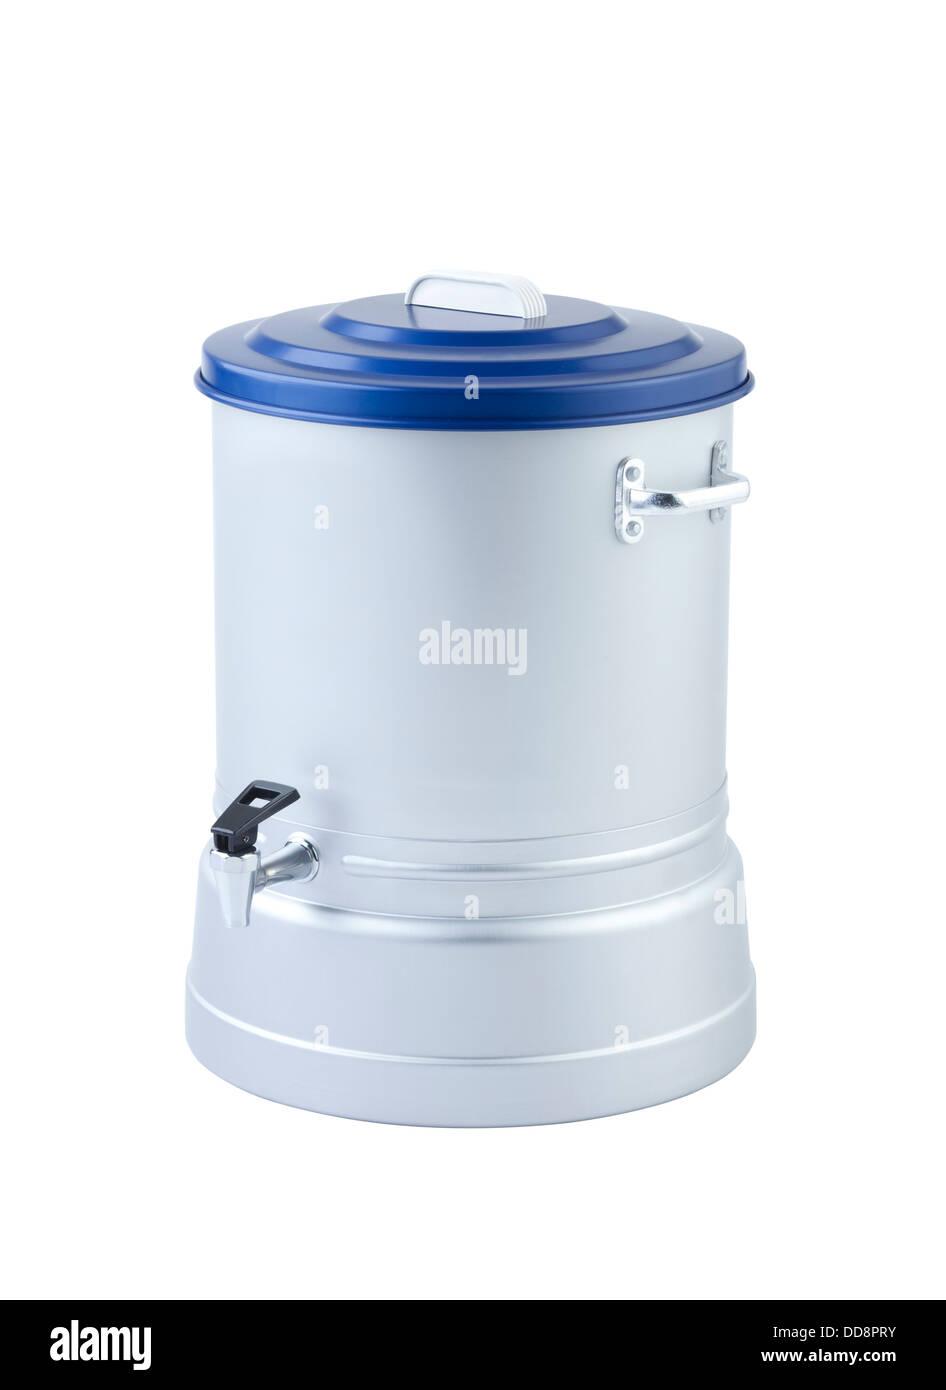 Aluminum water cooler isolated on white background - Stock Image